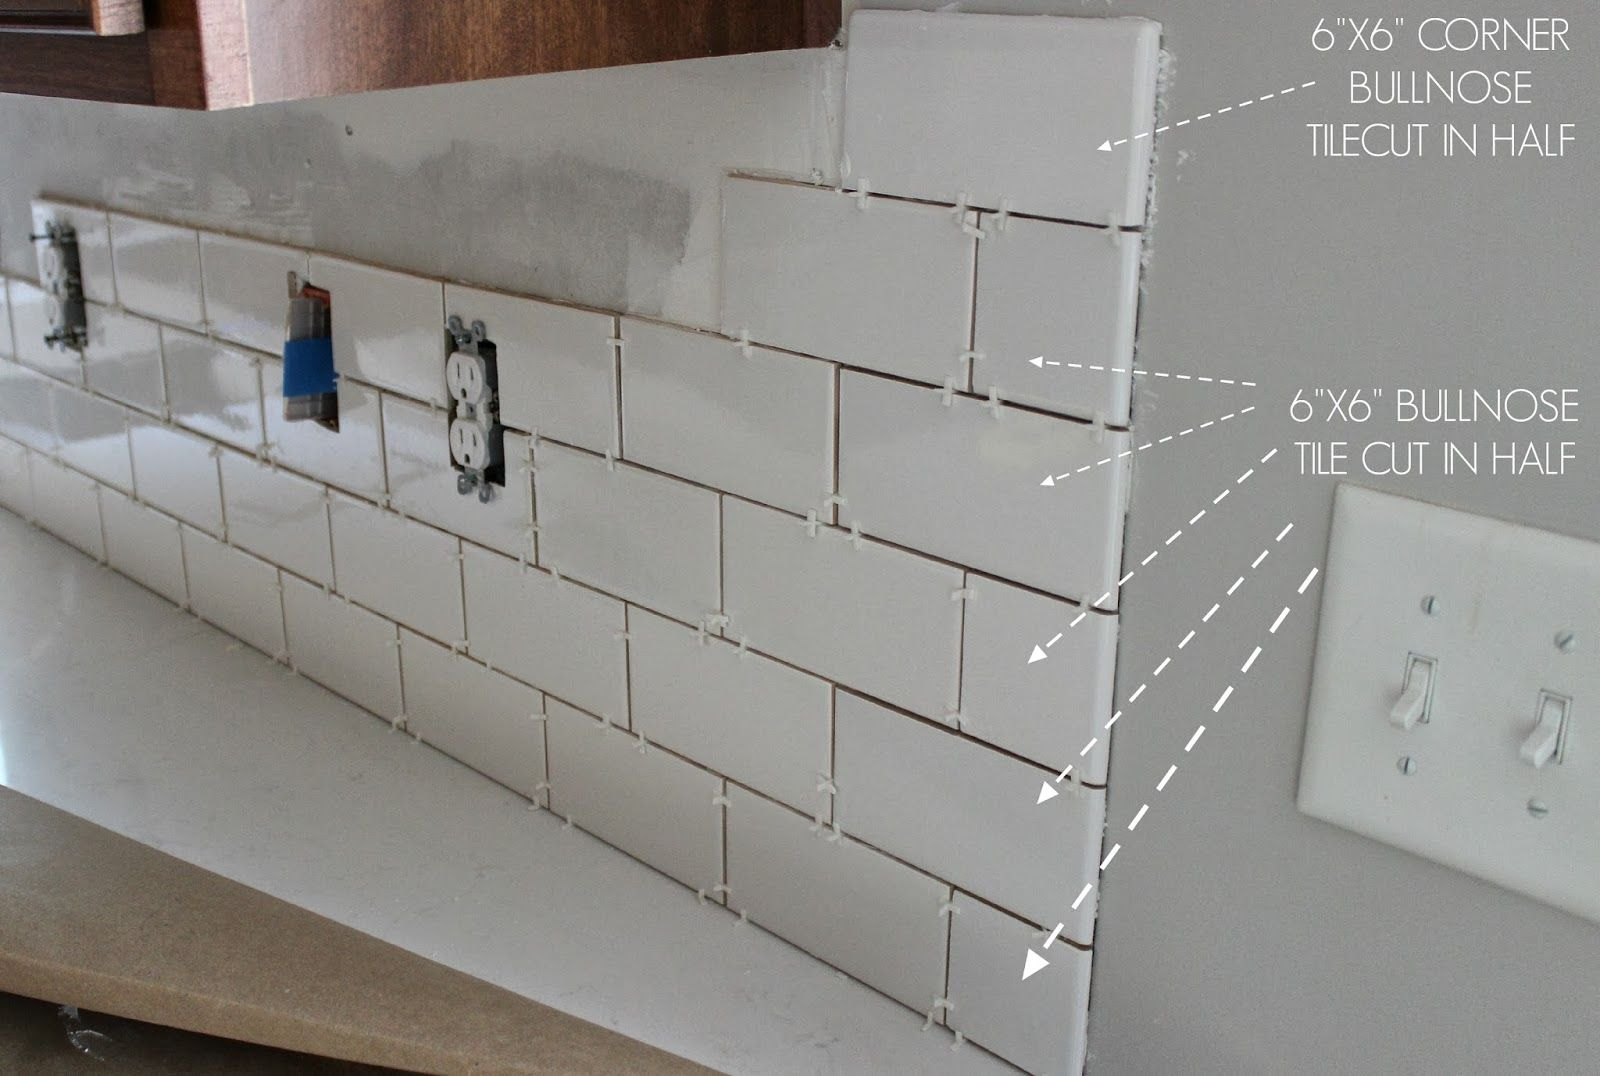 Kitchen chronicles a diy subway tile backsplash part 1 subway kitchen chronicles a diy subway tile backsplash part 1 dailygadgetfo Choice Image